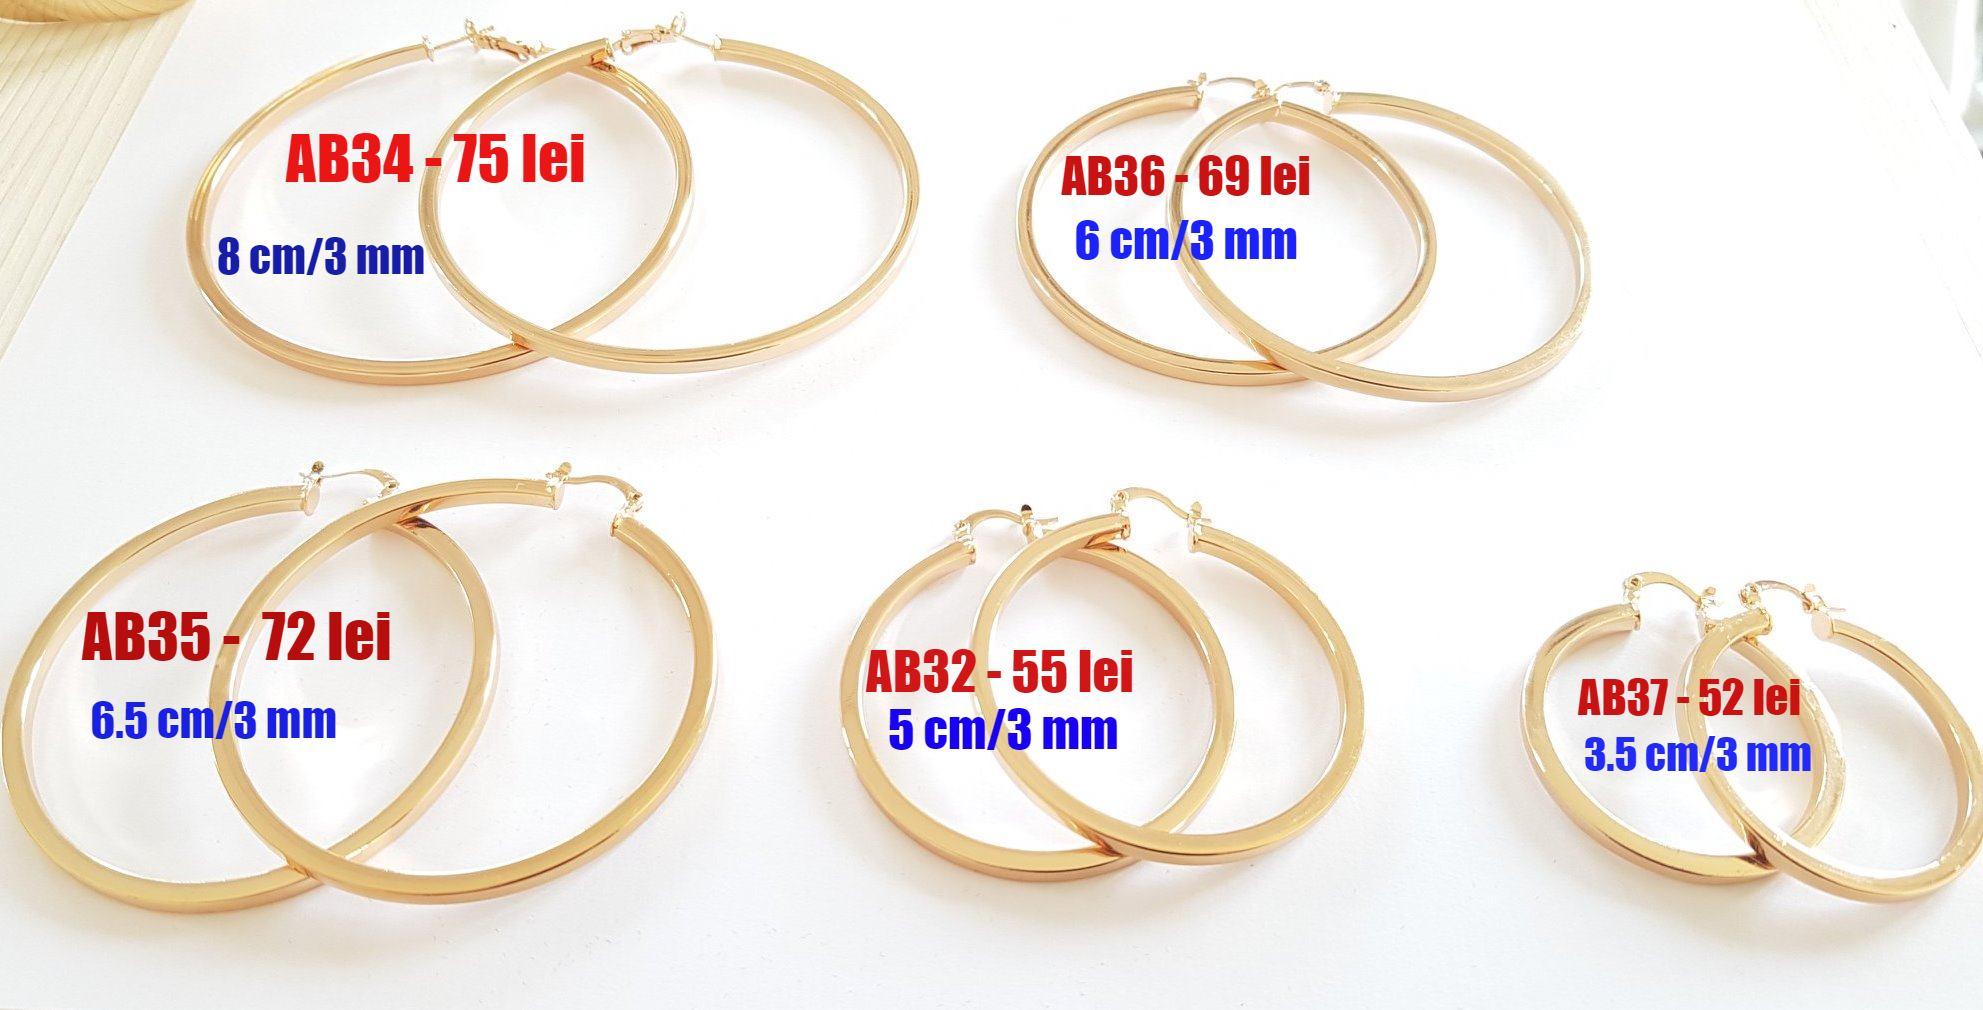 - Cercei inox auriti 18K - 3.5 cm - AB37